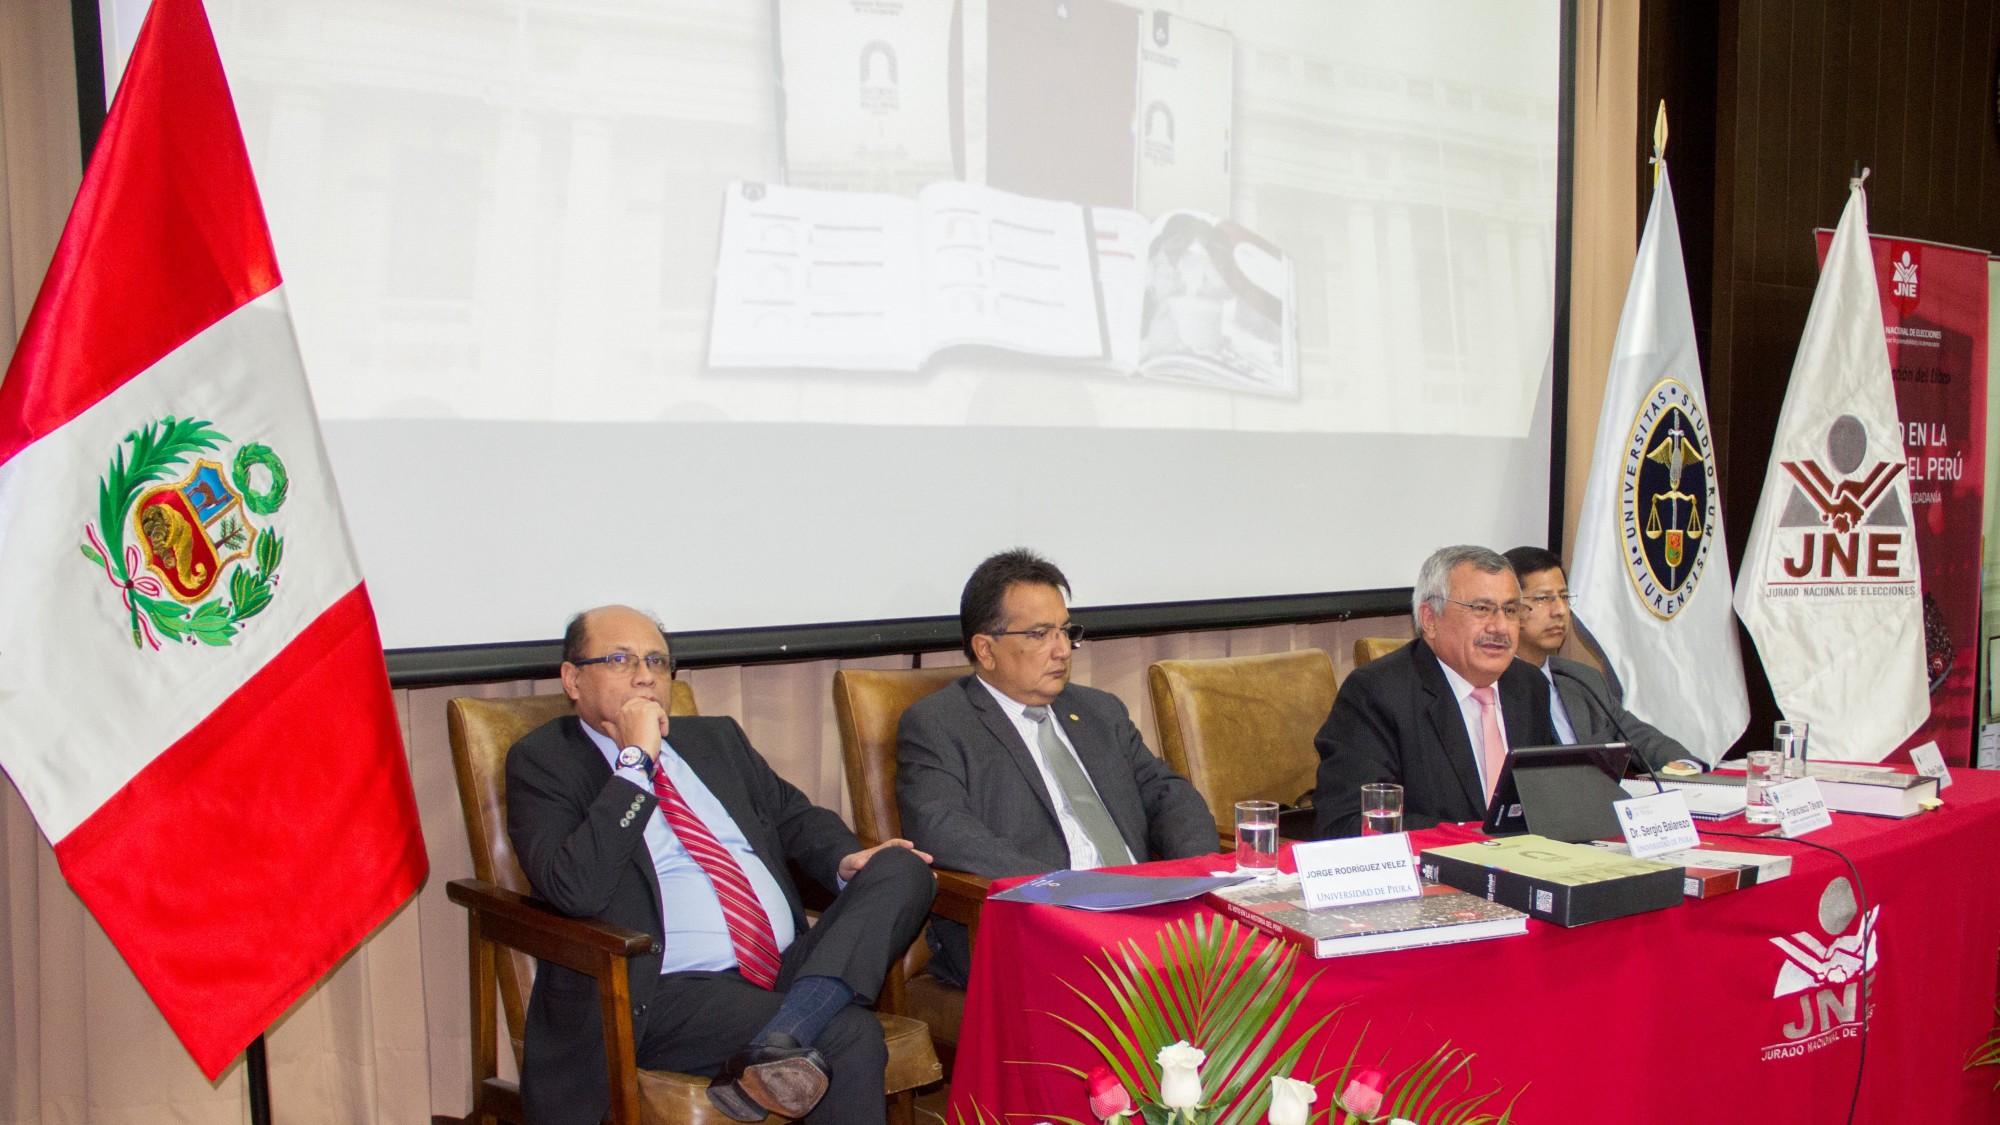 Presidente JNE entrega libros a UDEP-2